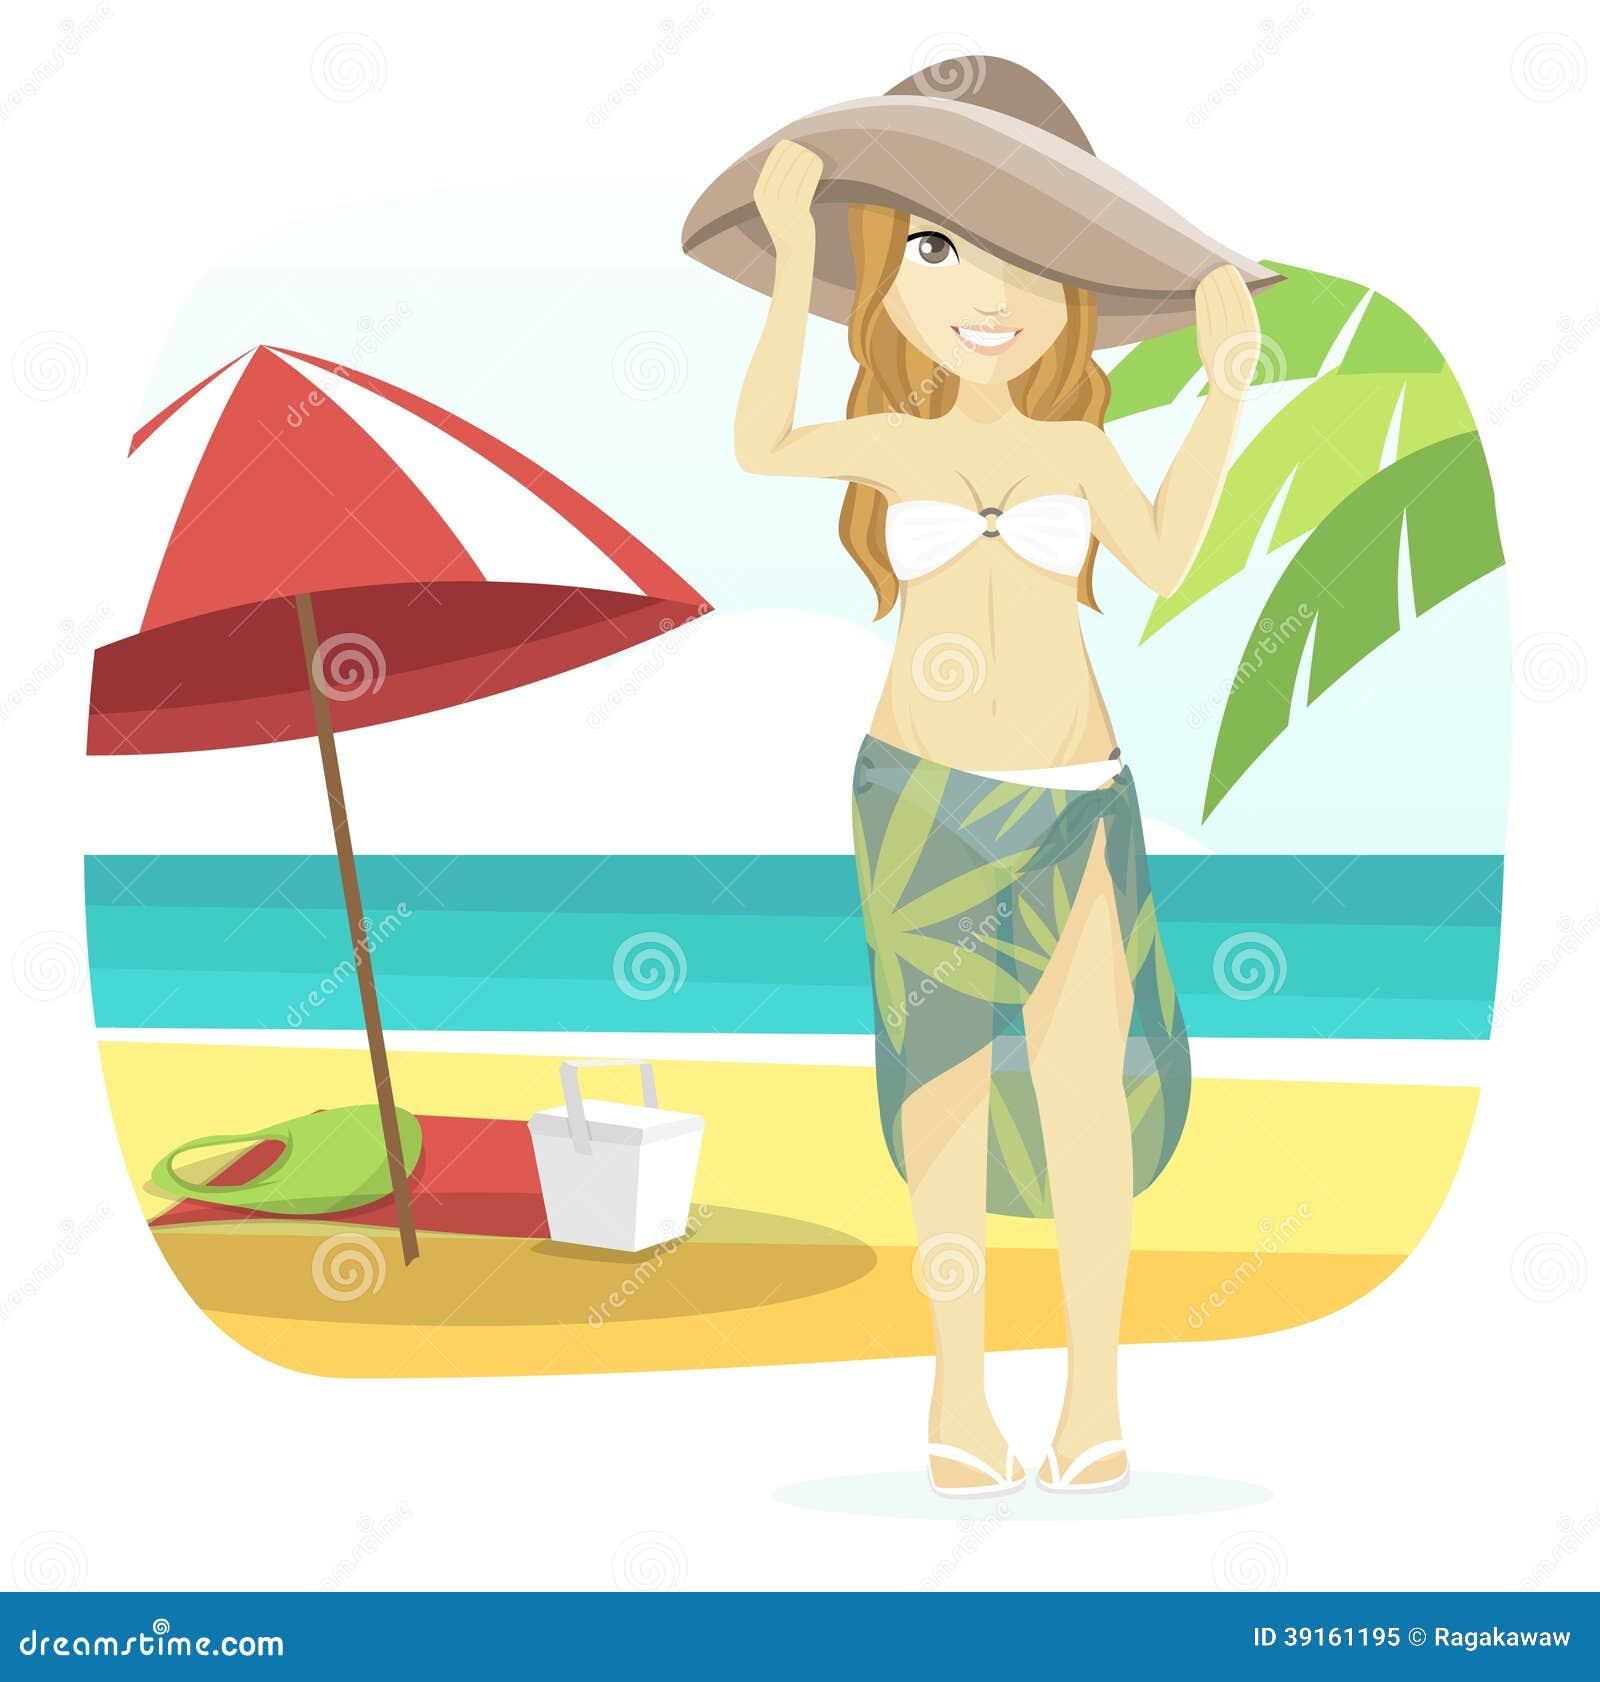 Woman Enjoying At Beach Stock Image Image Of Pleasure: Cute Beach Girl Stock Vector. Illustration Of People